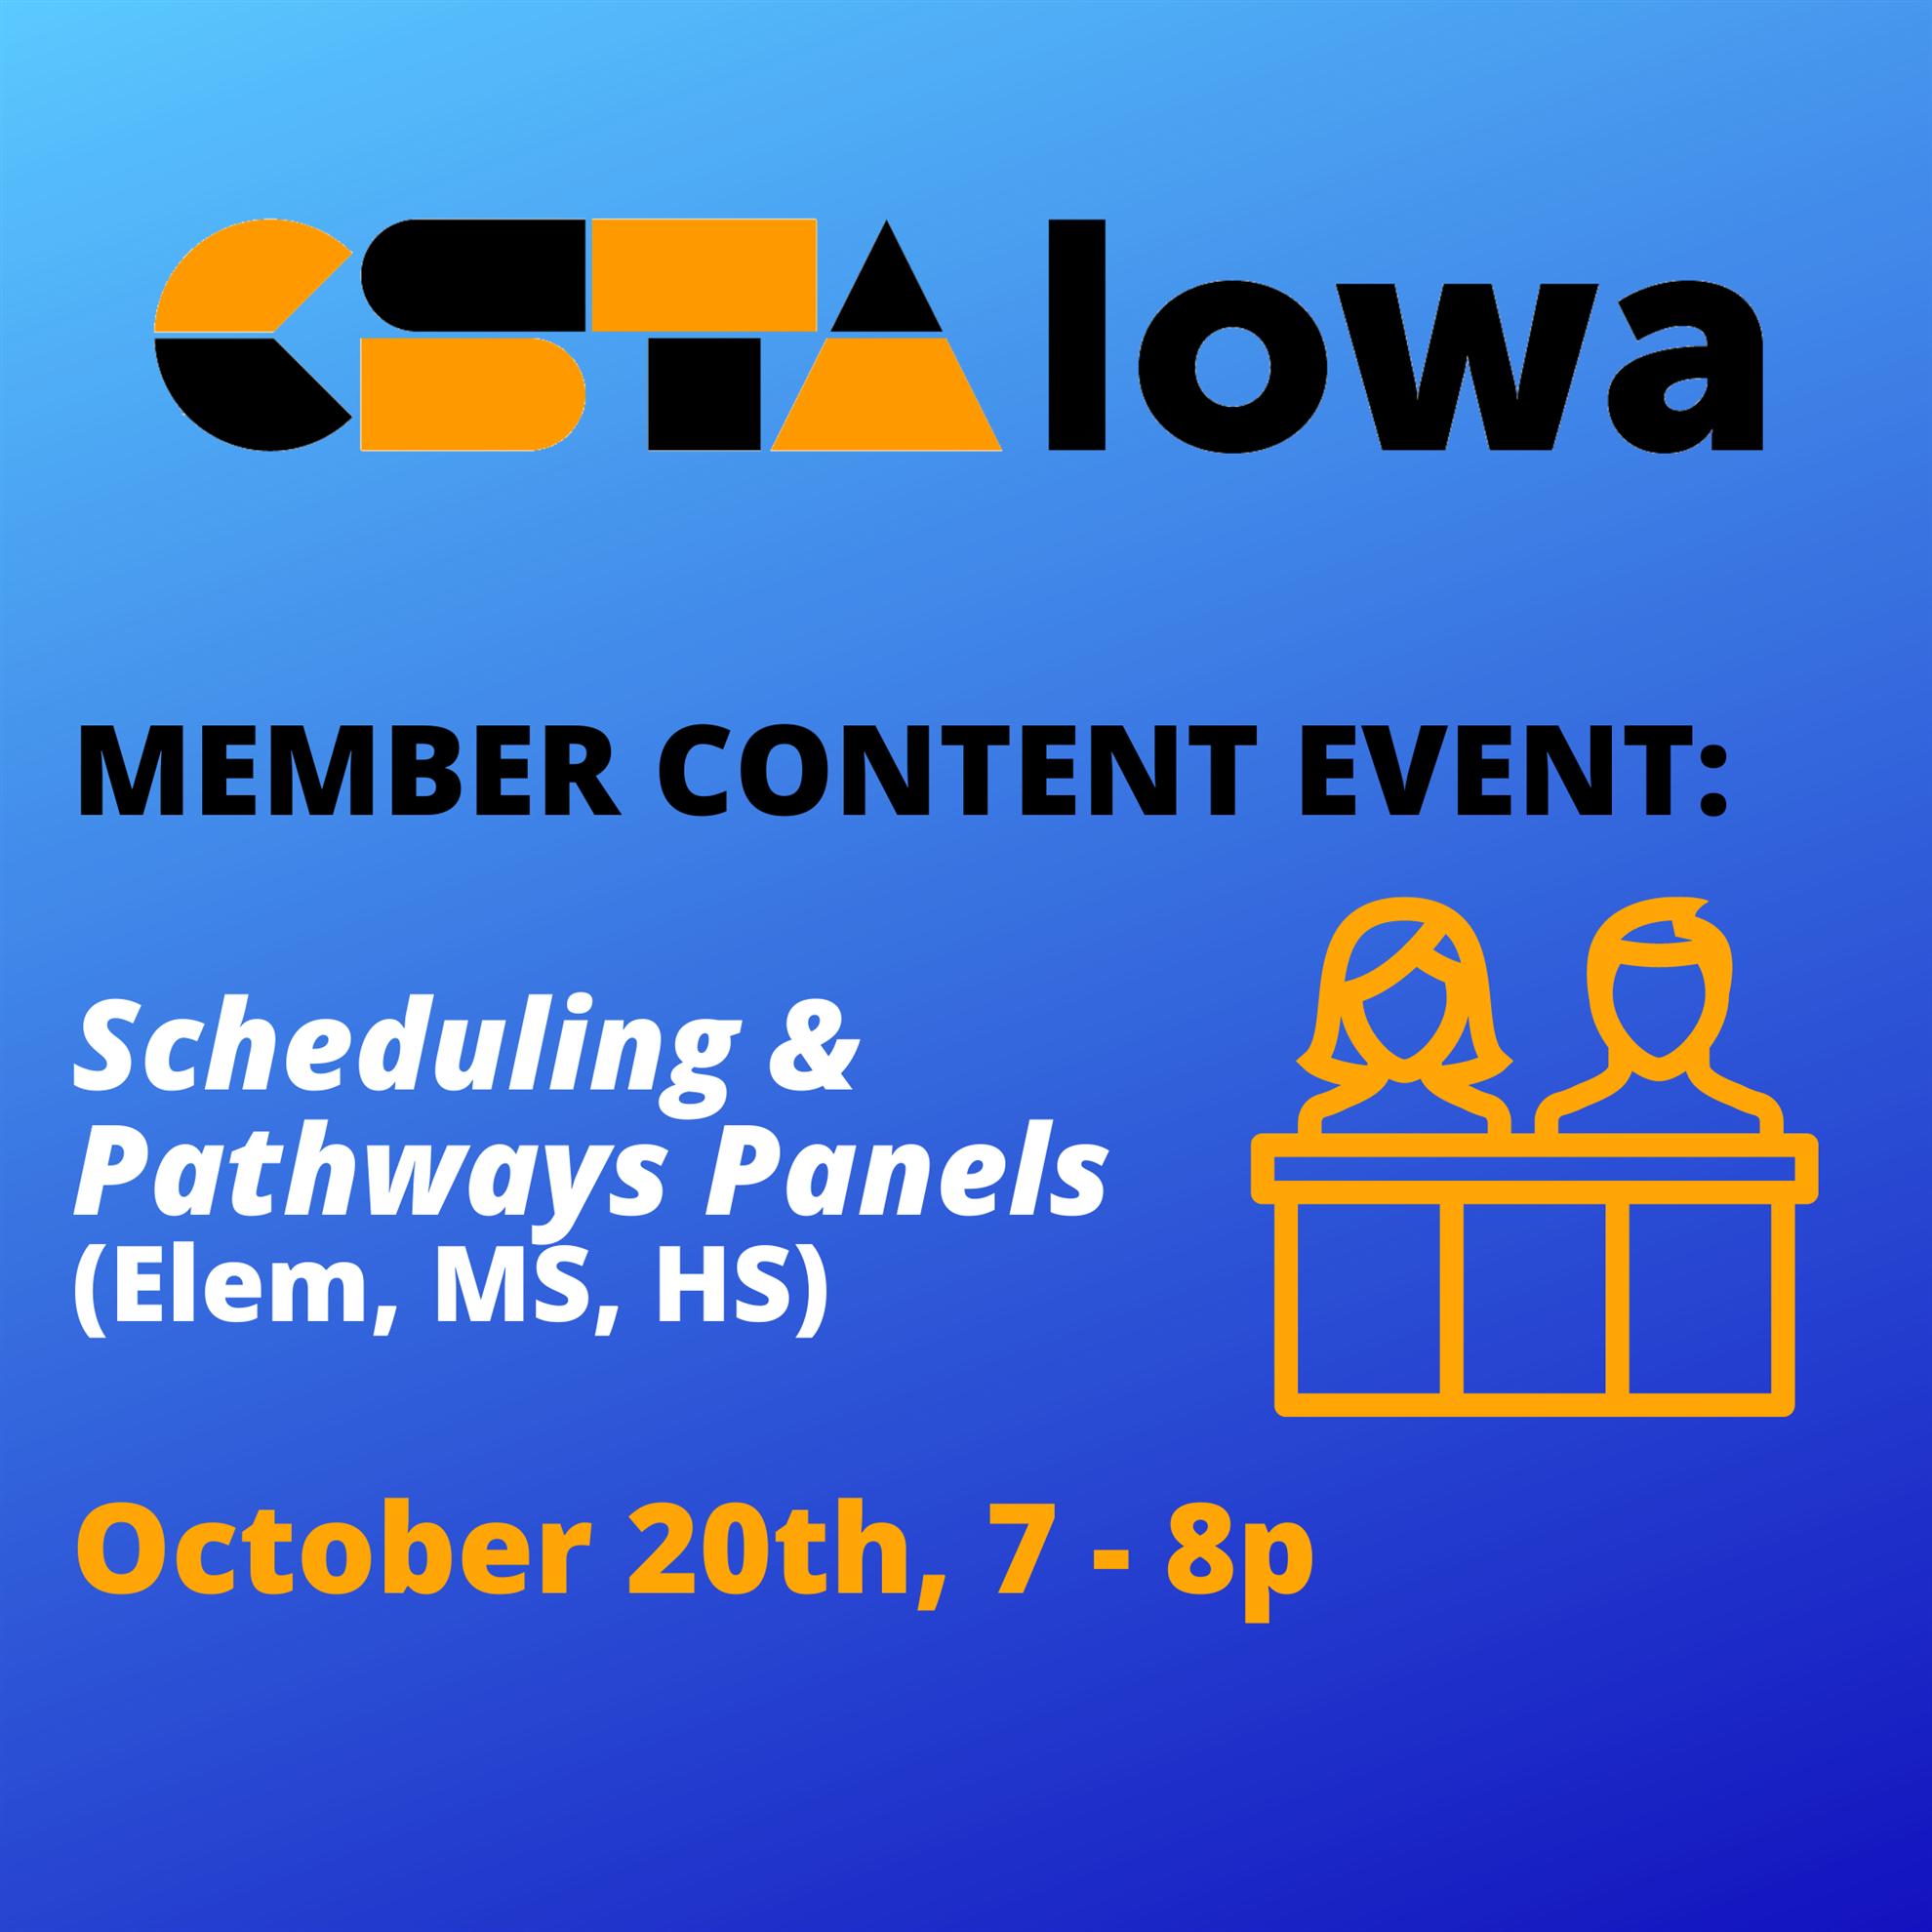 CSTA Iowa Member Meeting - Scheduling & Pathways Teacher Panel (CSTA Iowa)